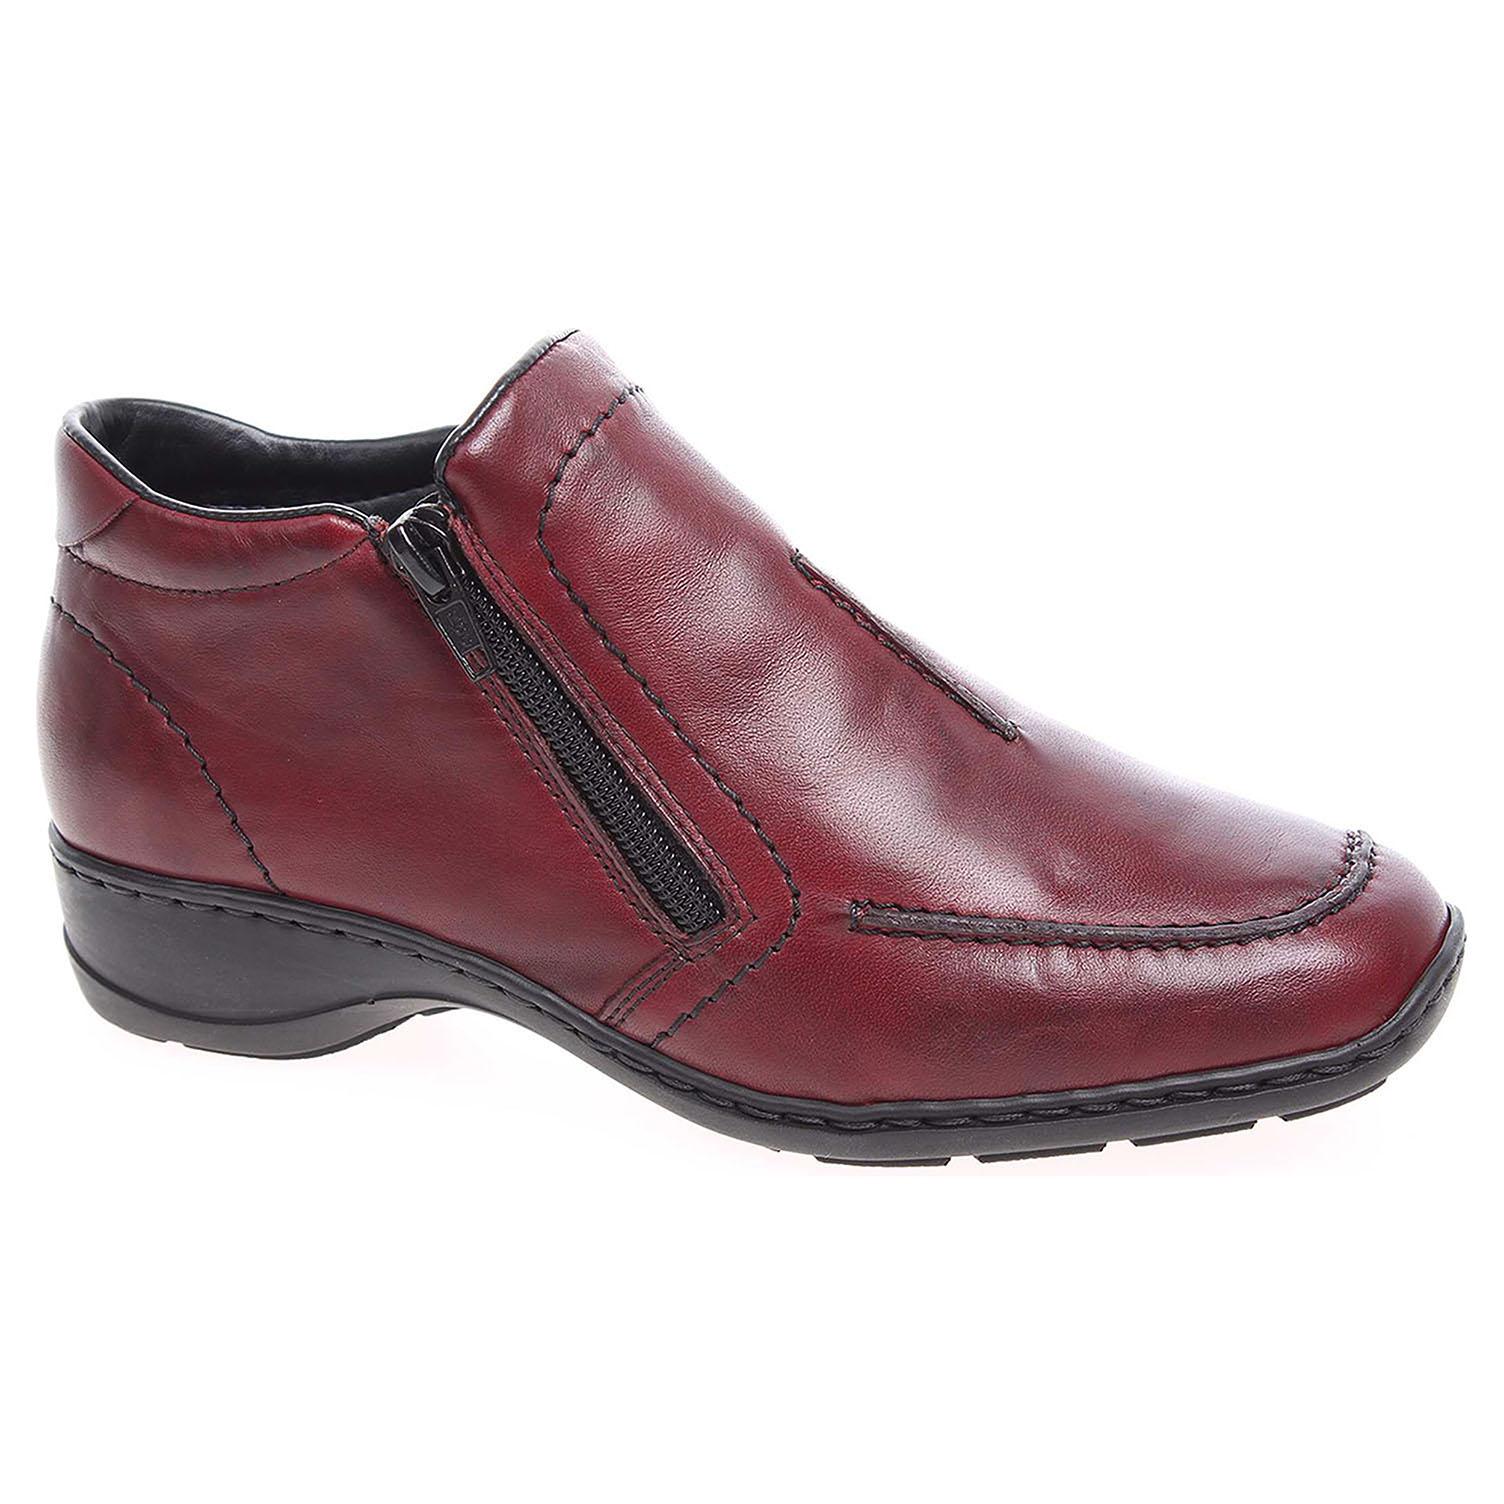 f5034a101556 detail Dámská obuv Rieker 58386-35 rot